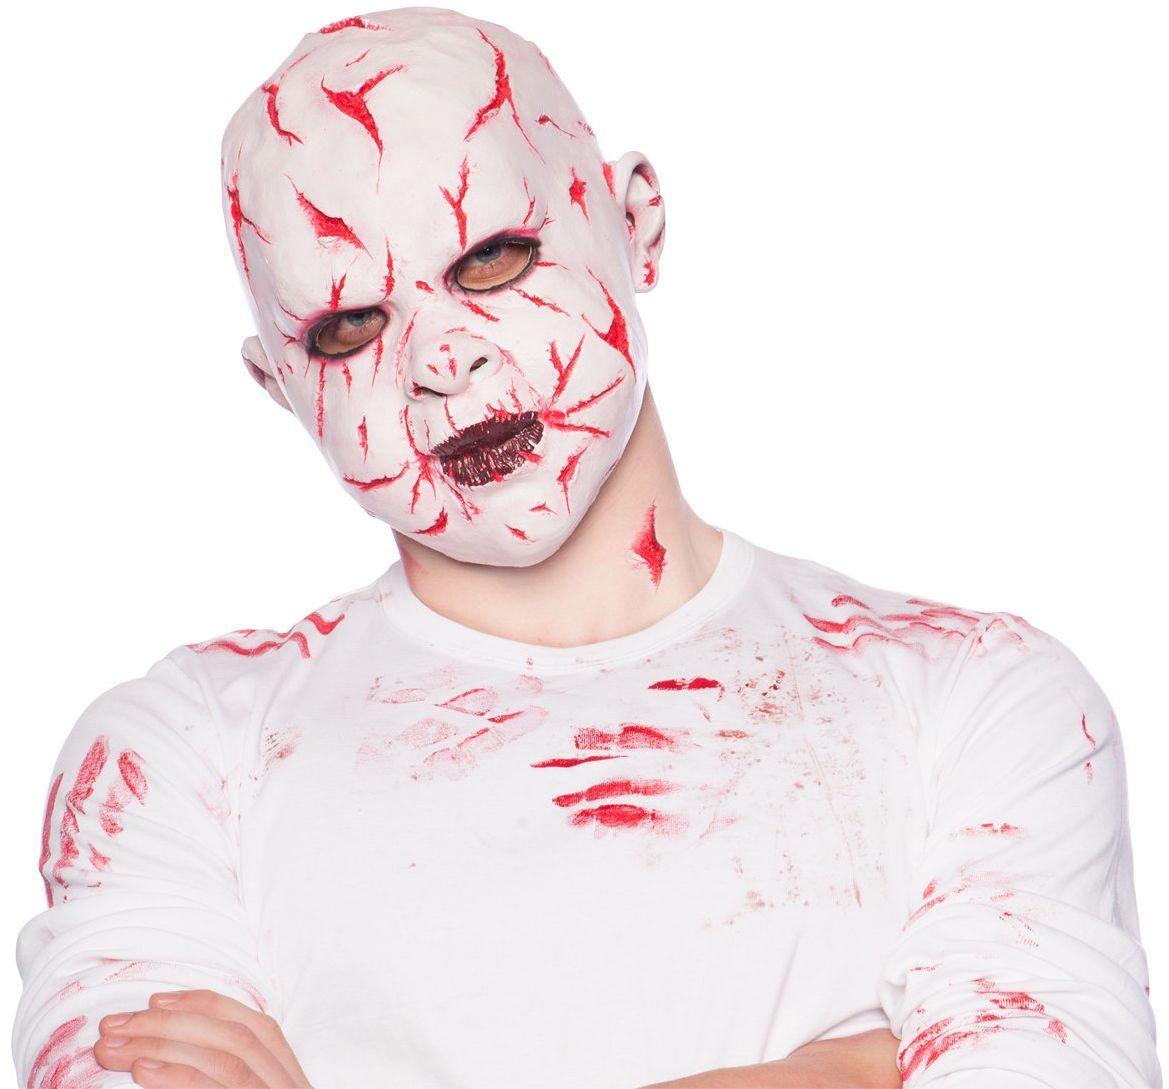 Folat 23827 Horror maska lateksowa Grusel Baby Halloween, wielokolorowa